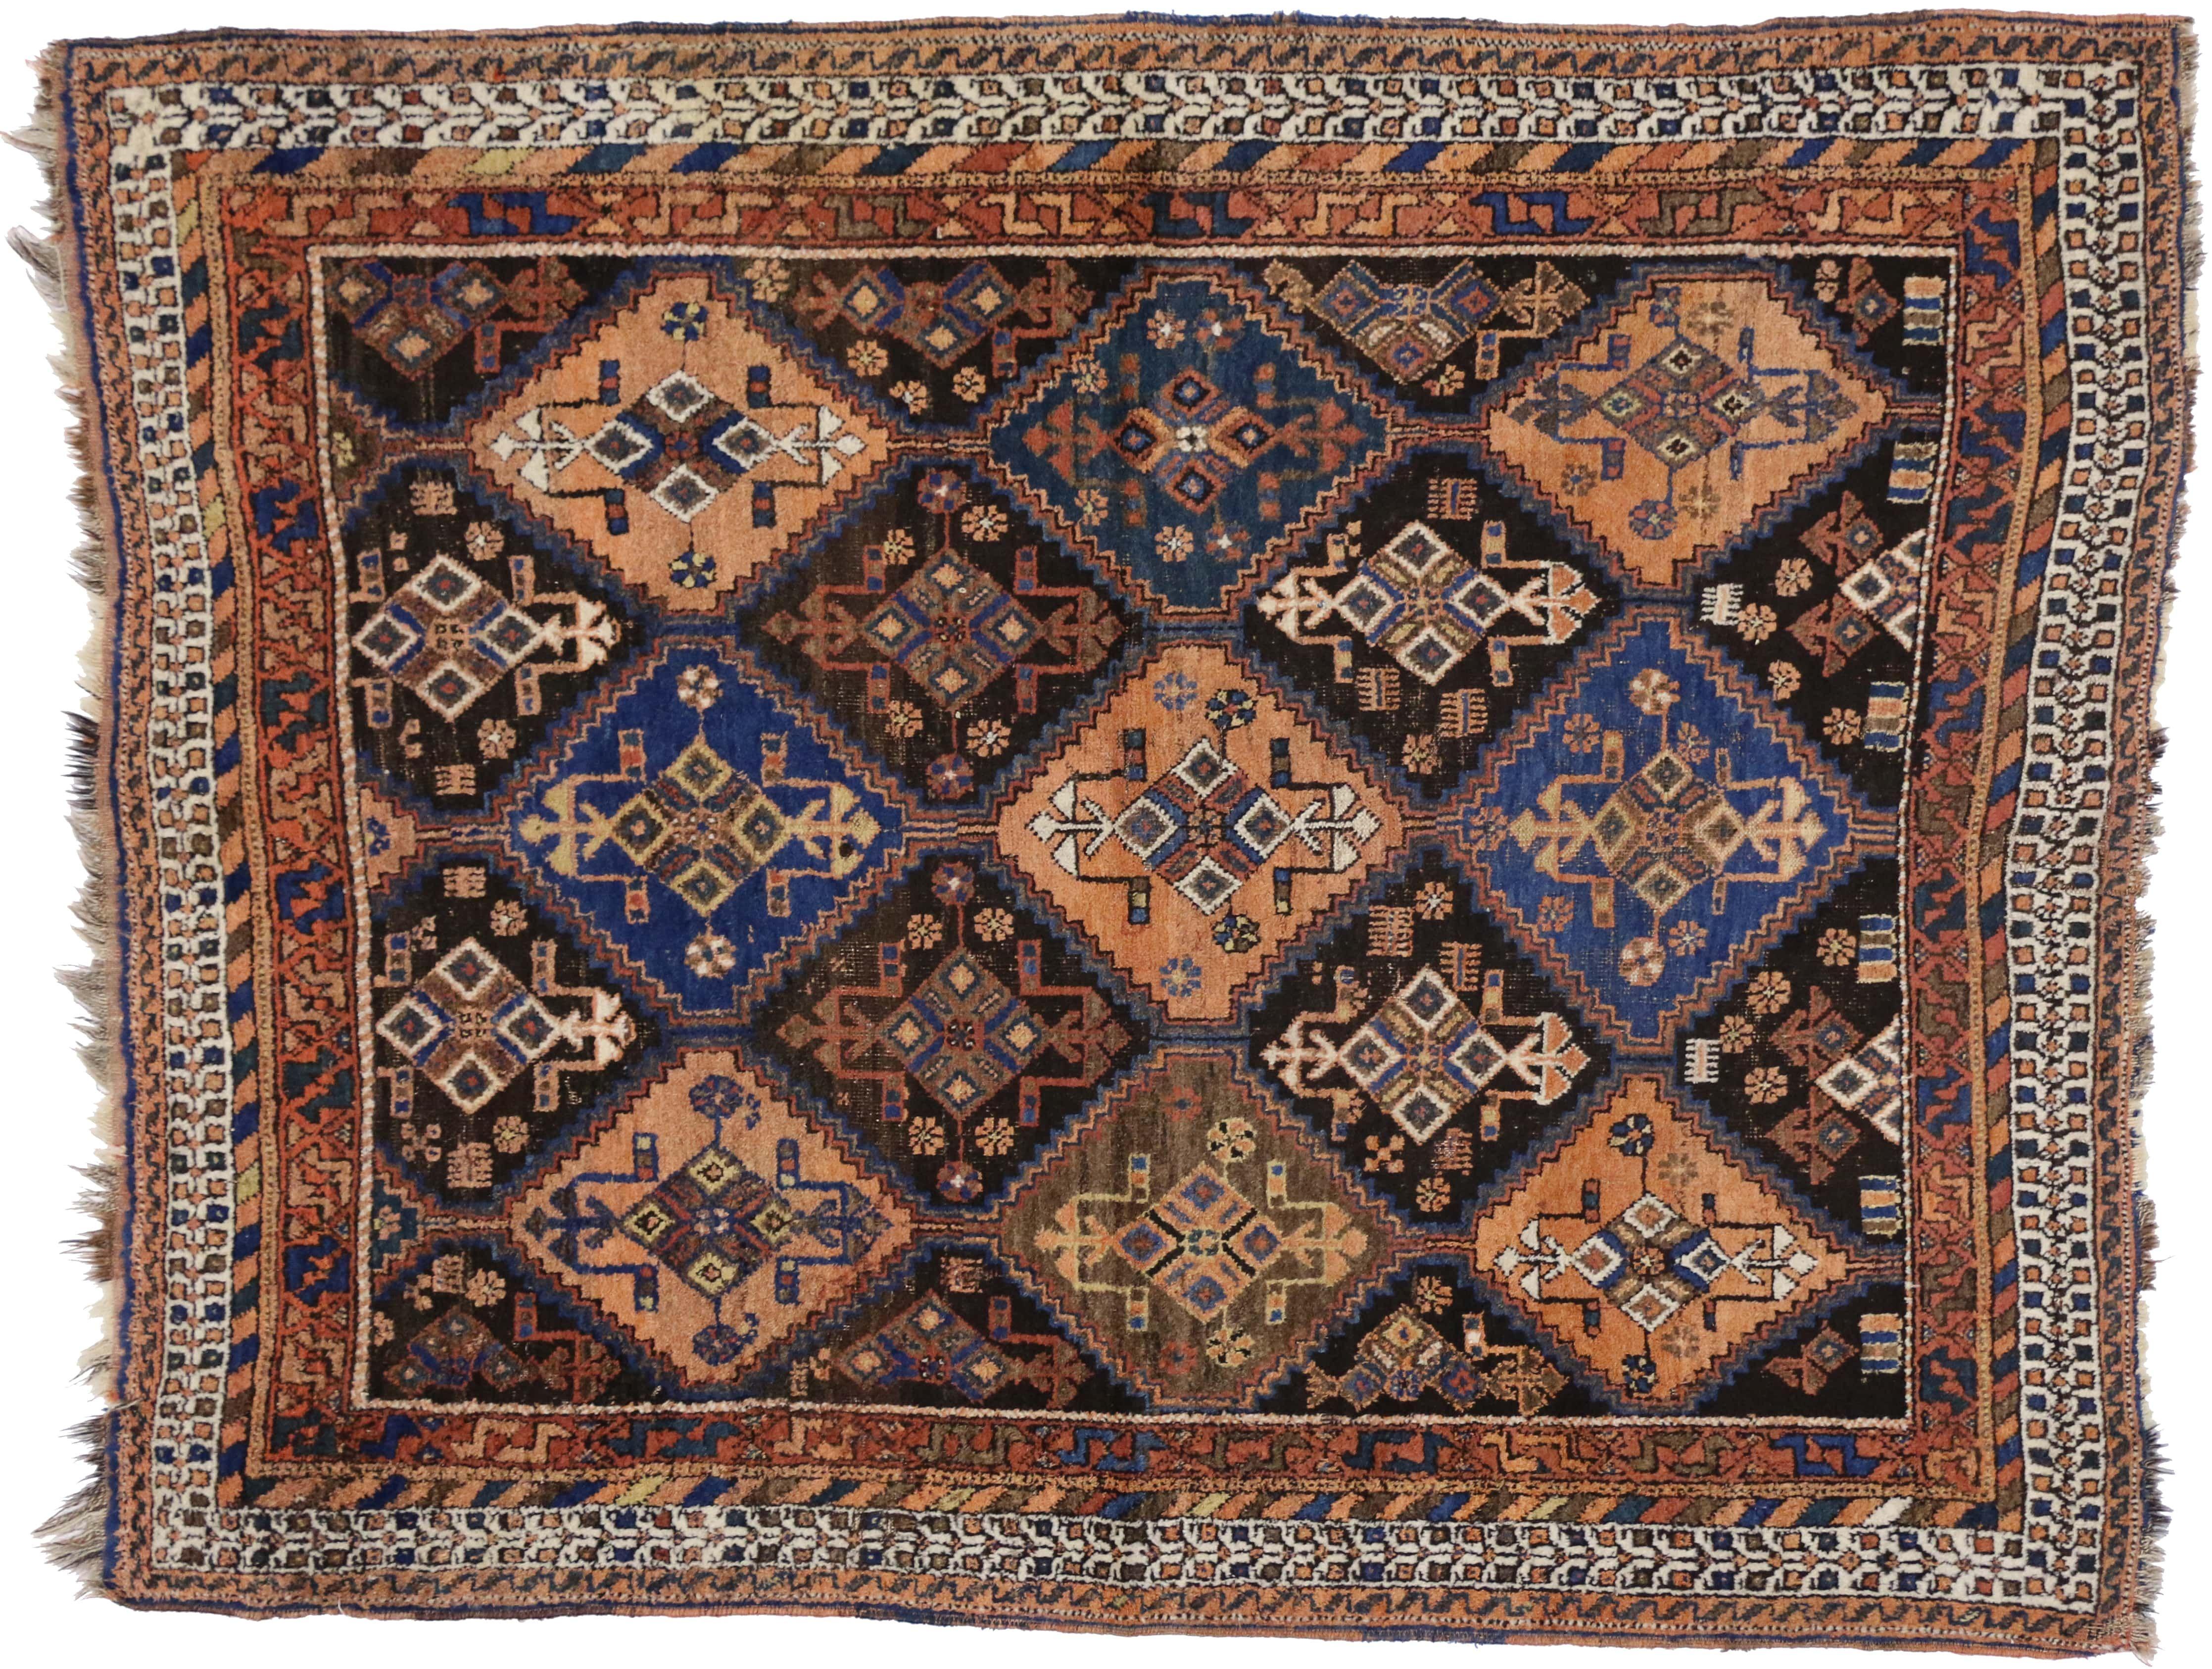 Antique Afshar Oriental Rug 4 X 5 Rugs Oriental Rug Rugs And